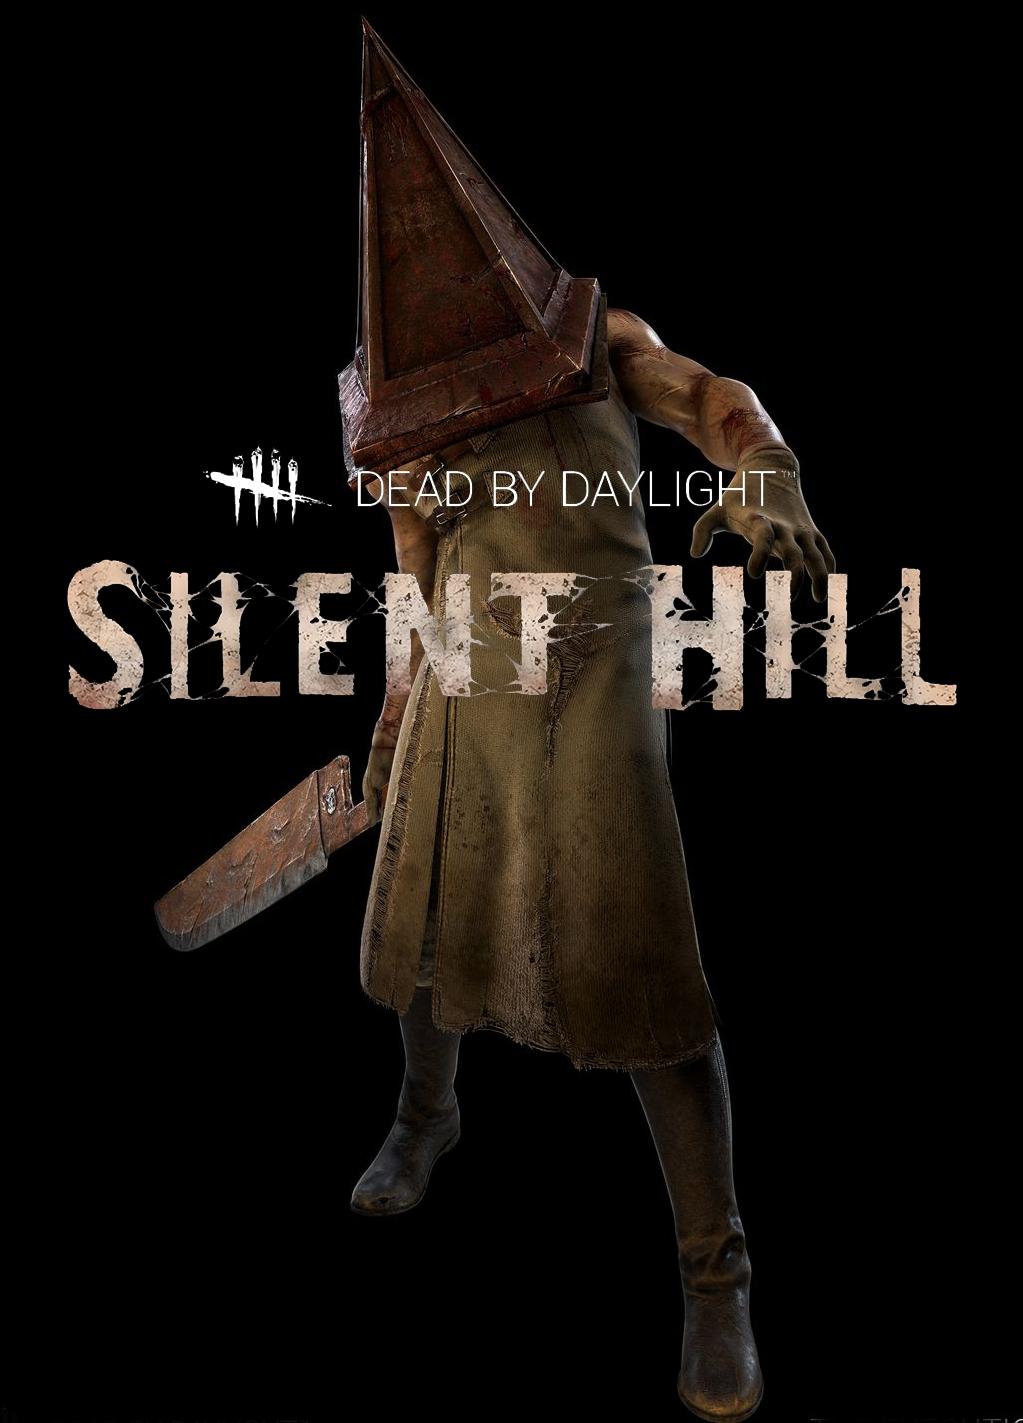 Dead By Daylight. Silent Hill Chapter. Дополнение (Steam-версия) [PC, Цифровая версия] (Цифровая версия) фото